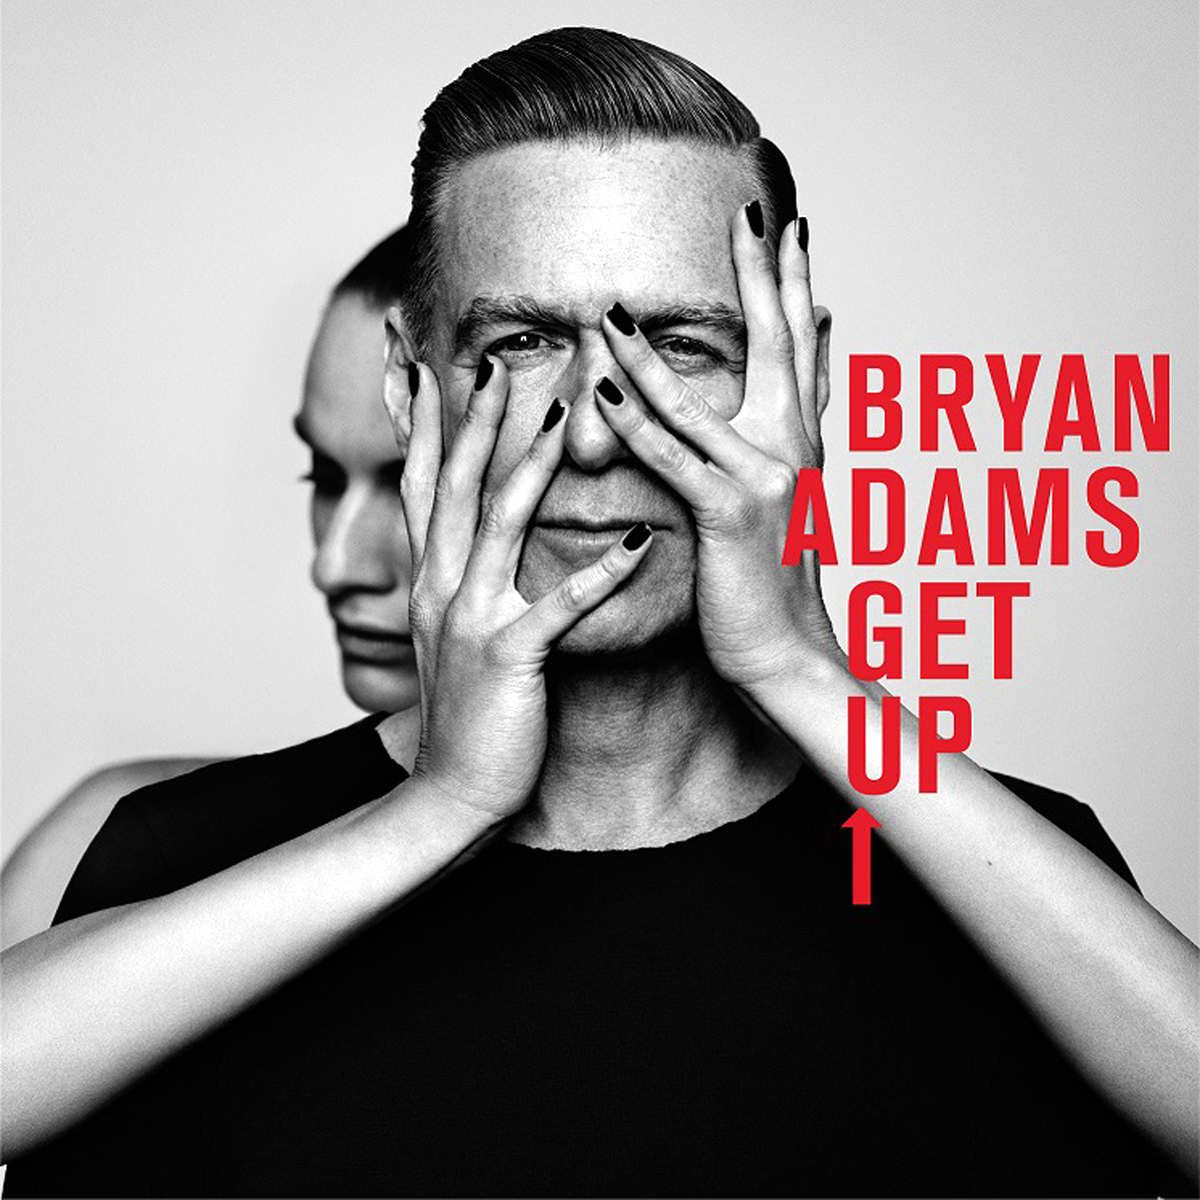 bryan_adams-get_up_a